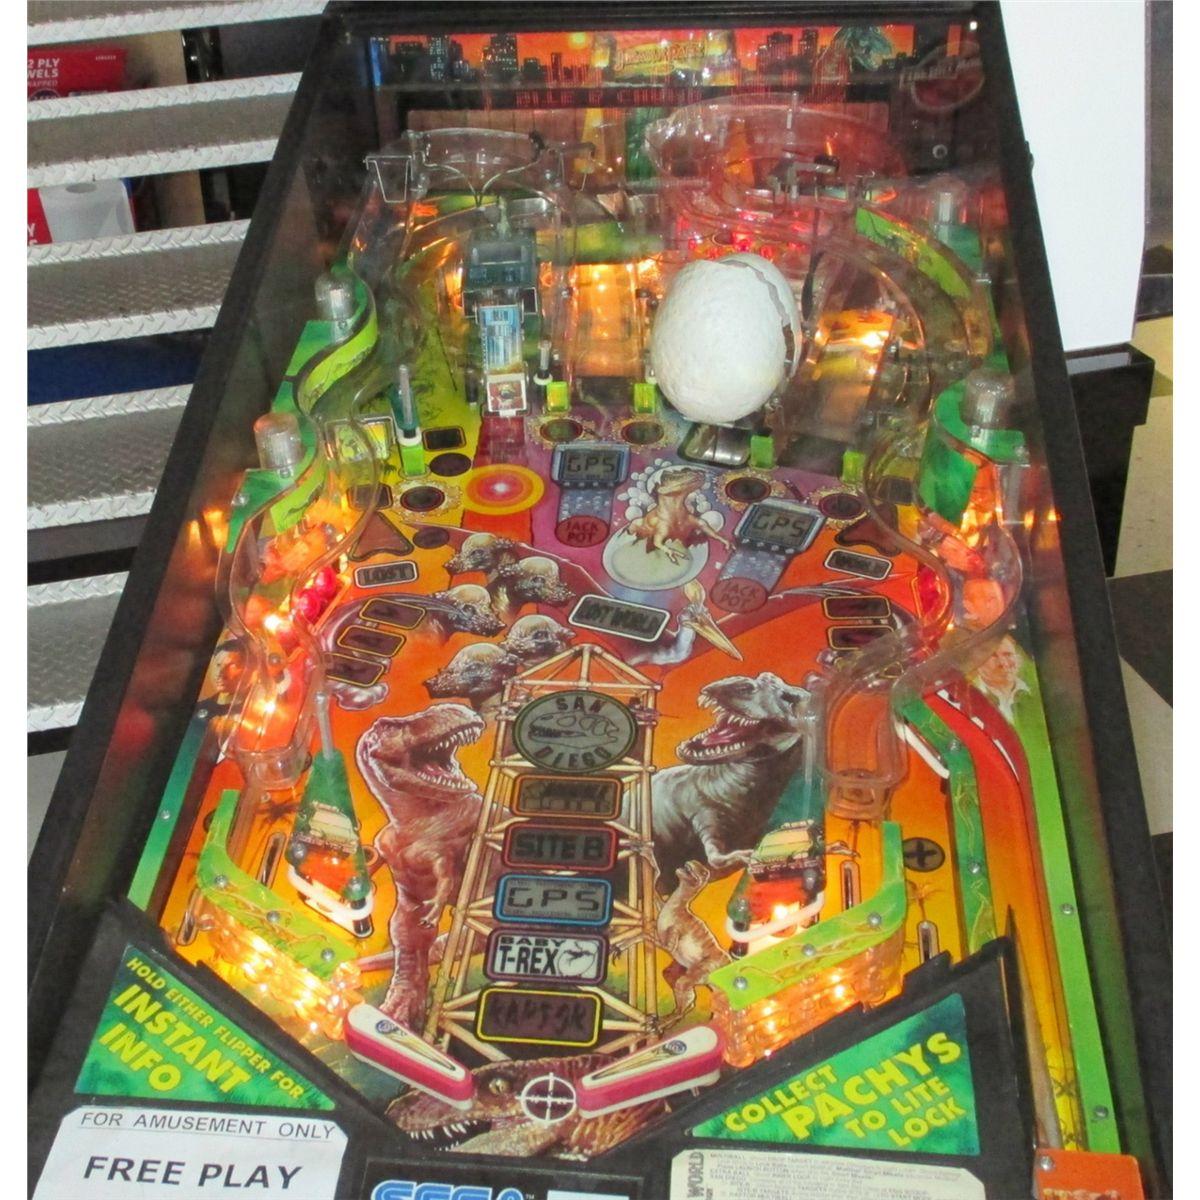 JURASSIC PARK PINBALL MACHINE ~ THE LOST WORLD by SEGA